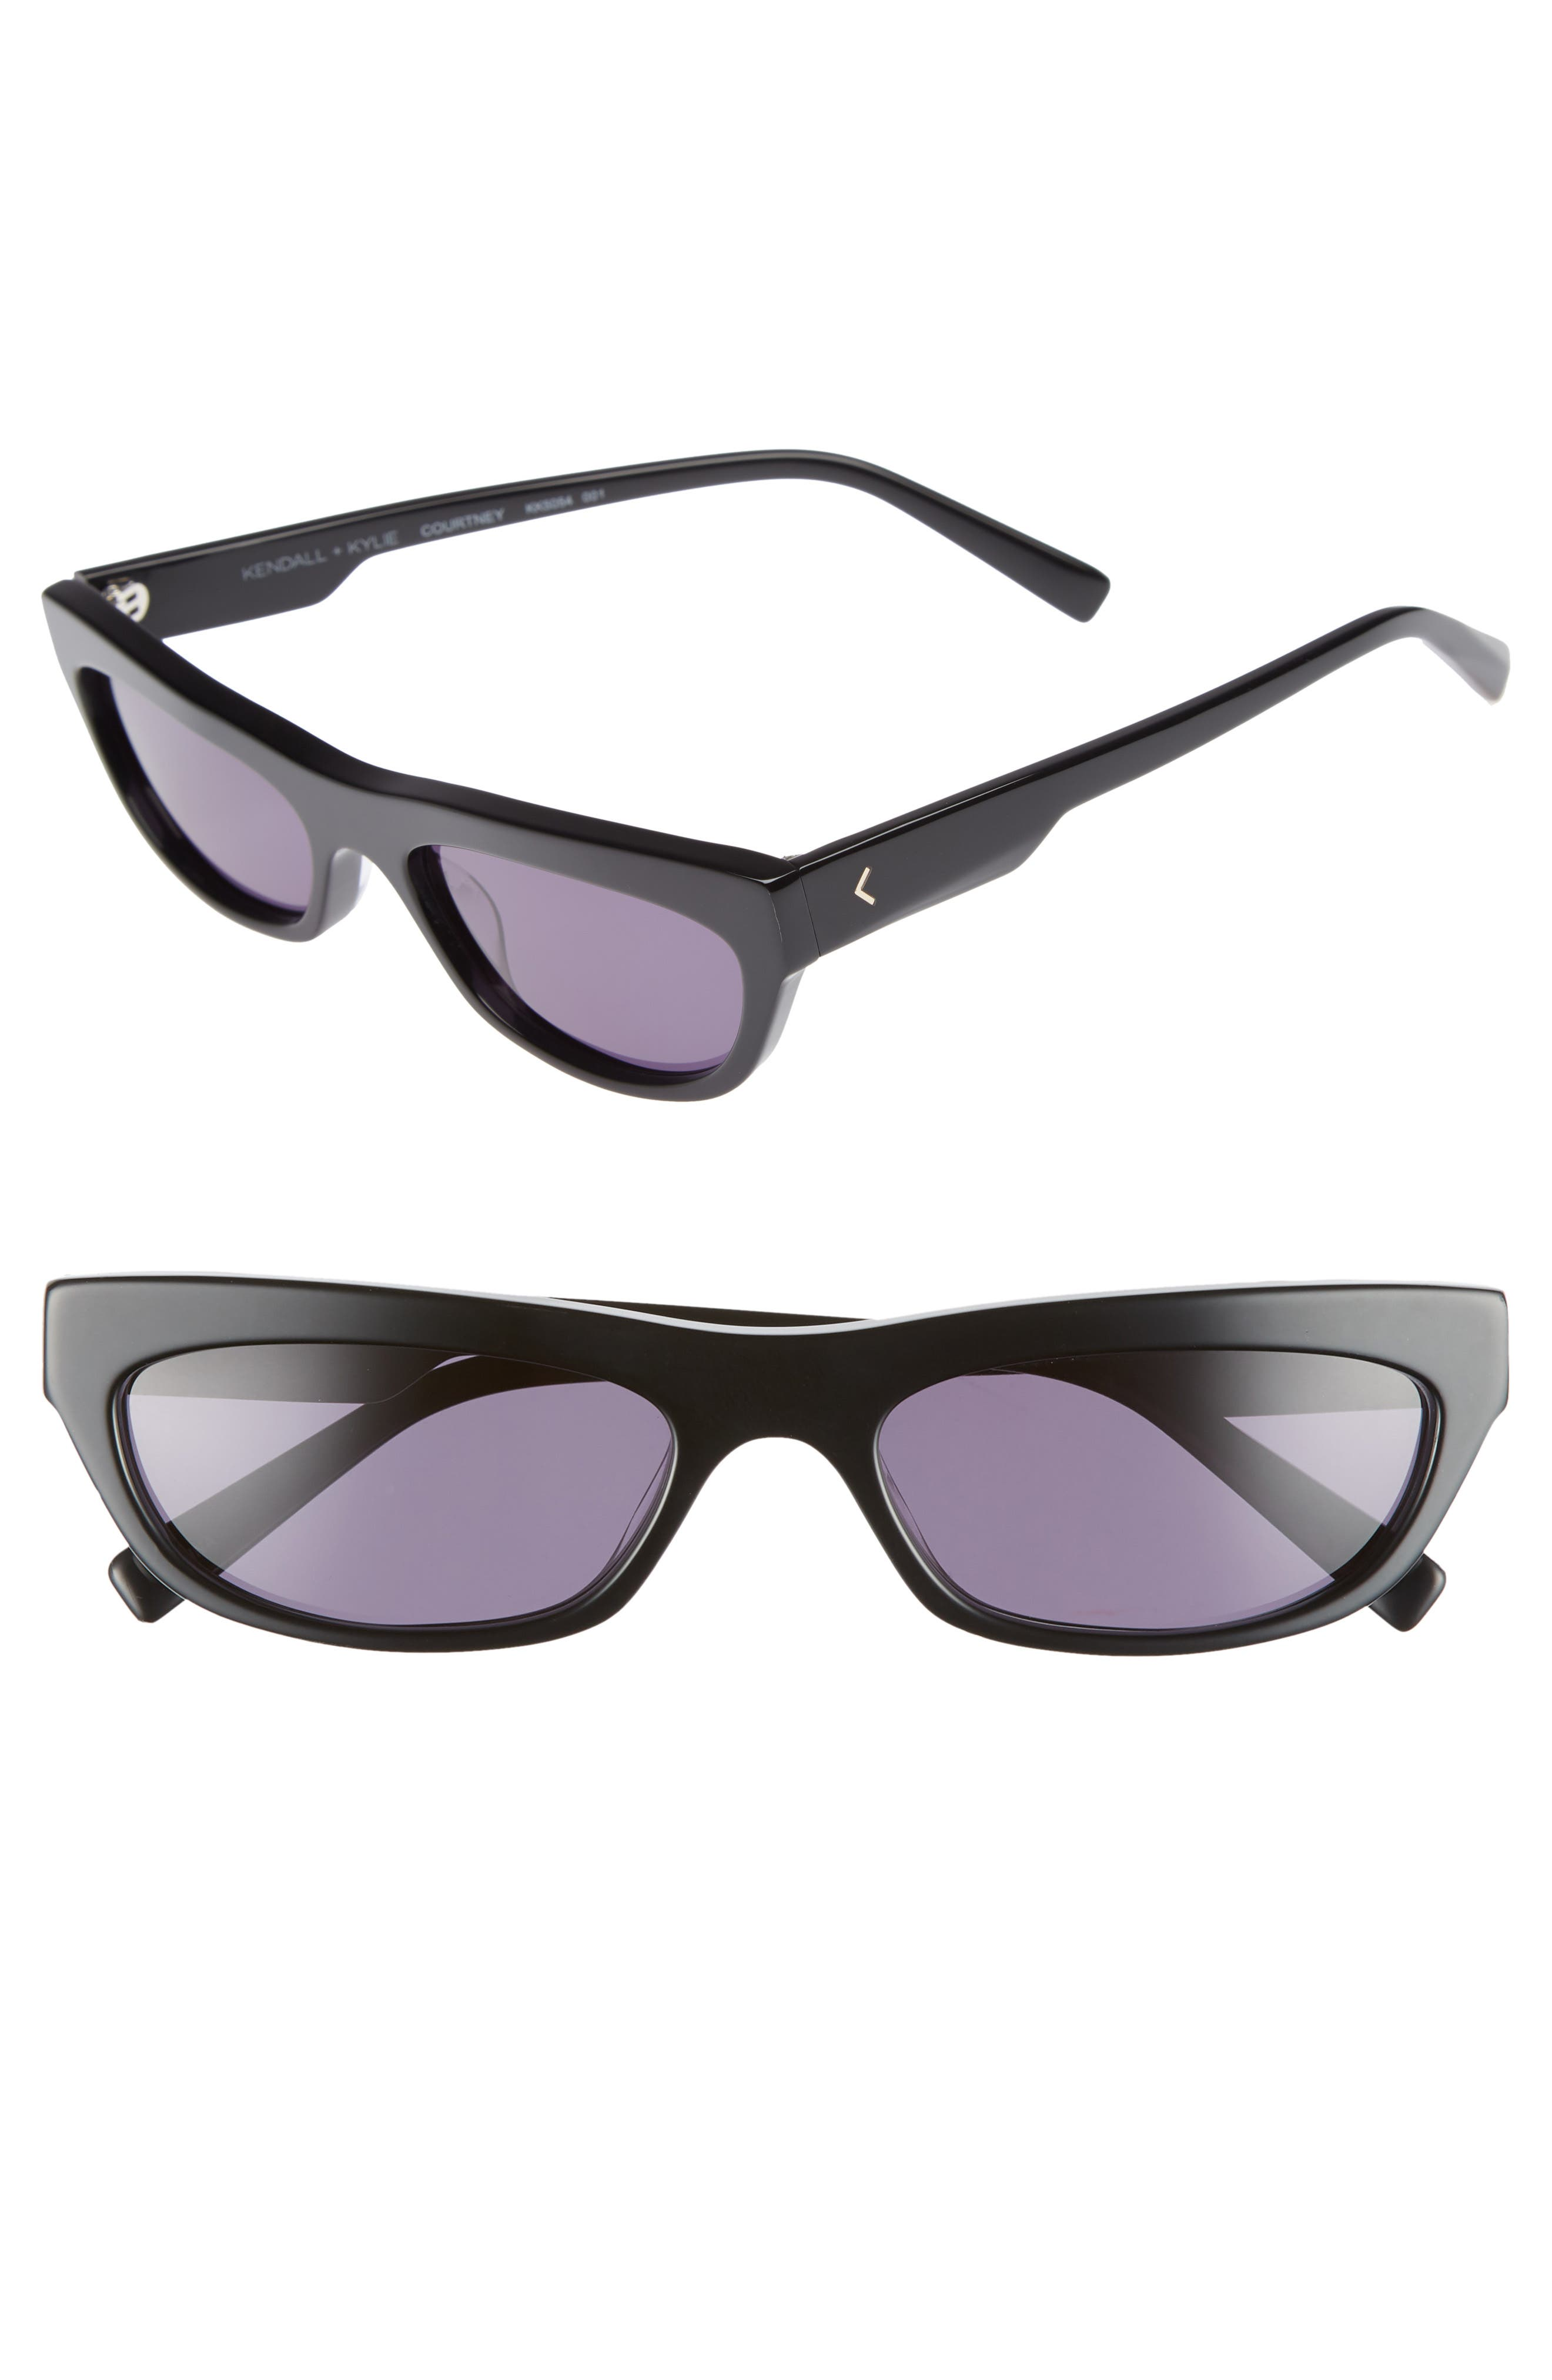 KENDALL + KYLIE Courtney 55mm Cat Eye Sunglasses